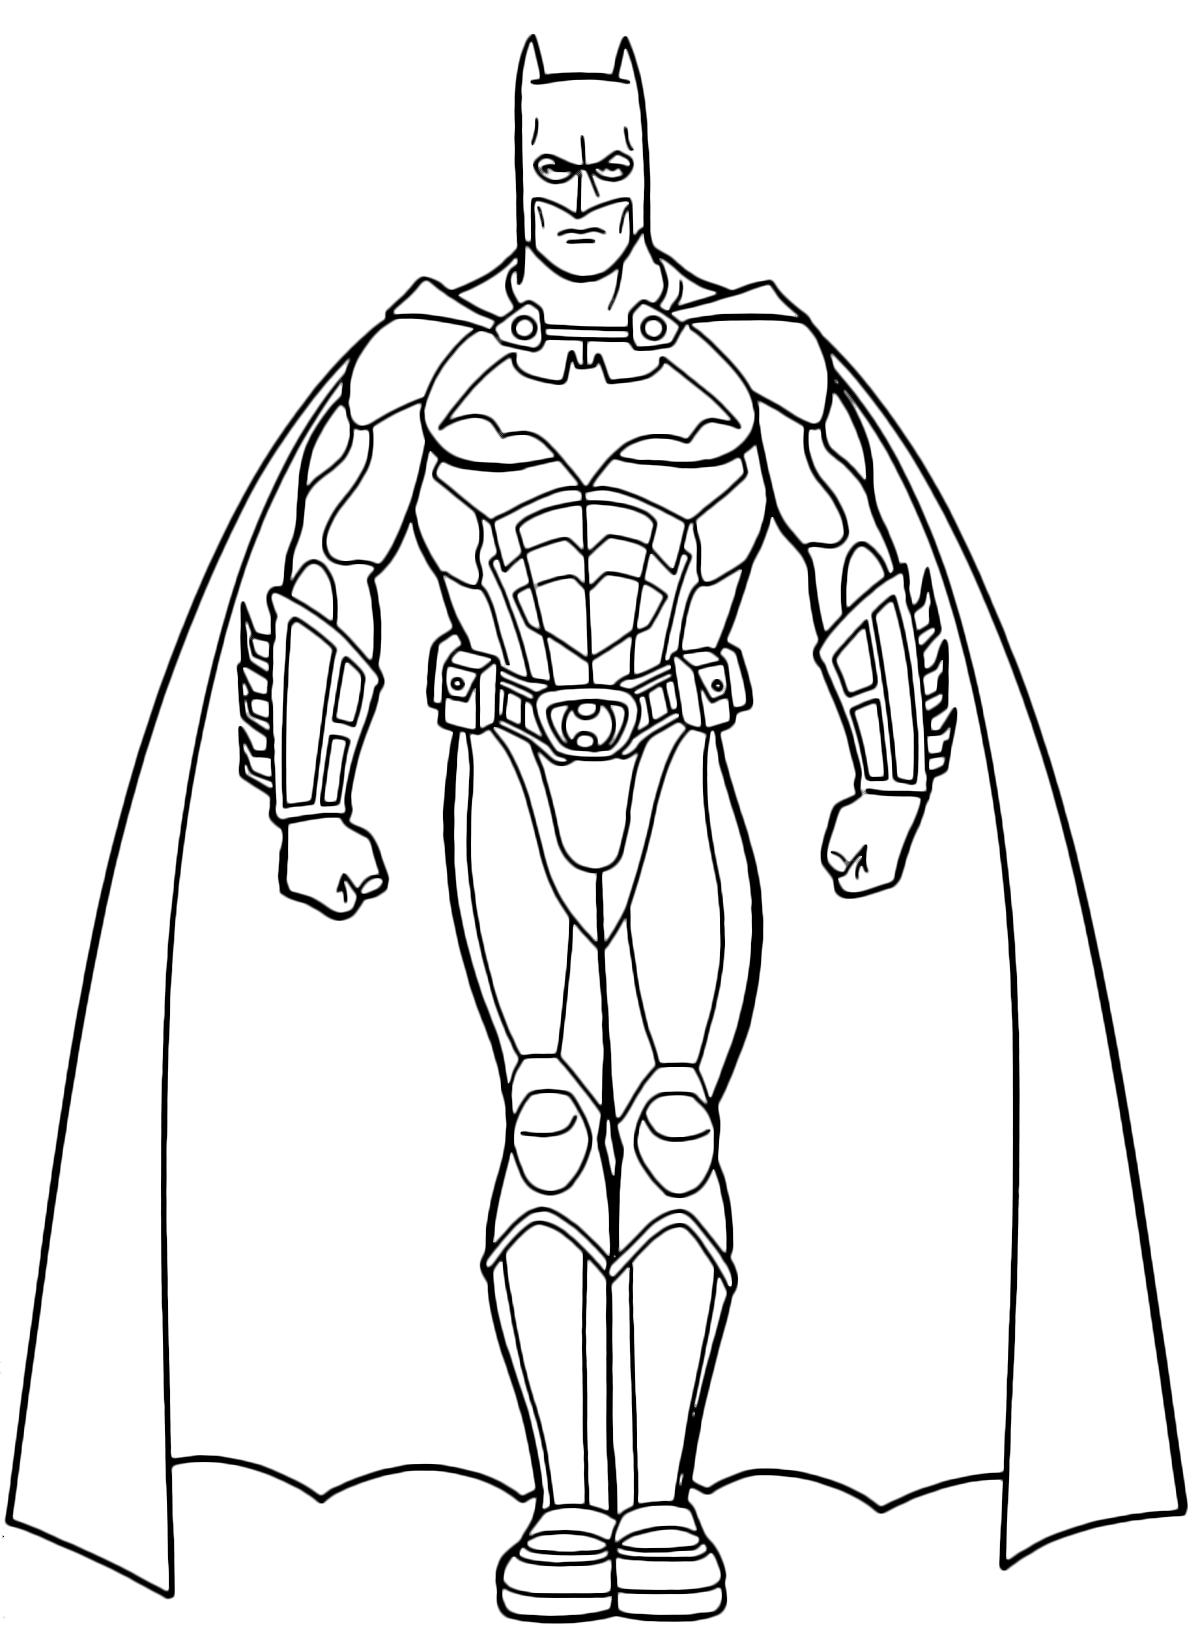 Batman Coloring Pages Pdf : Disegni di quot batman da colorare